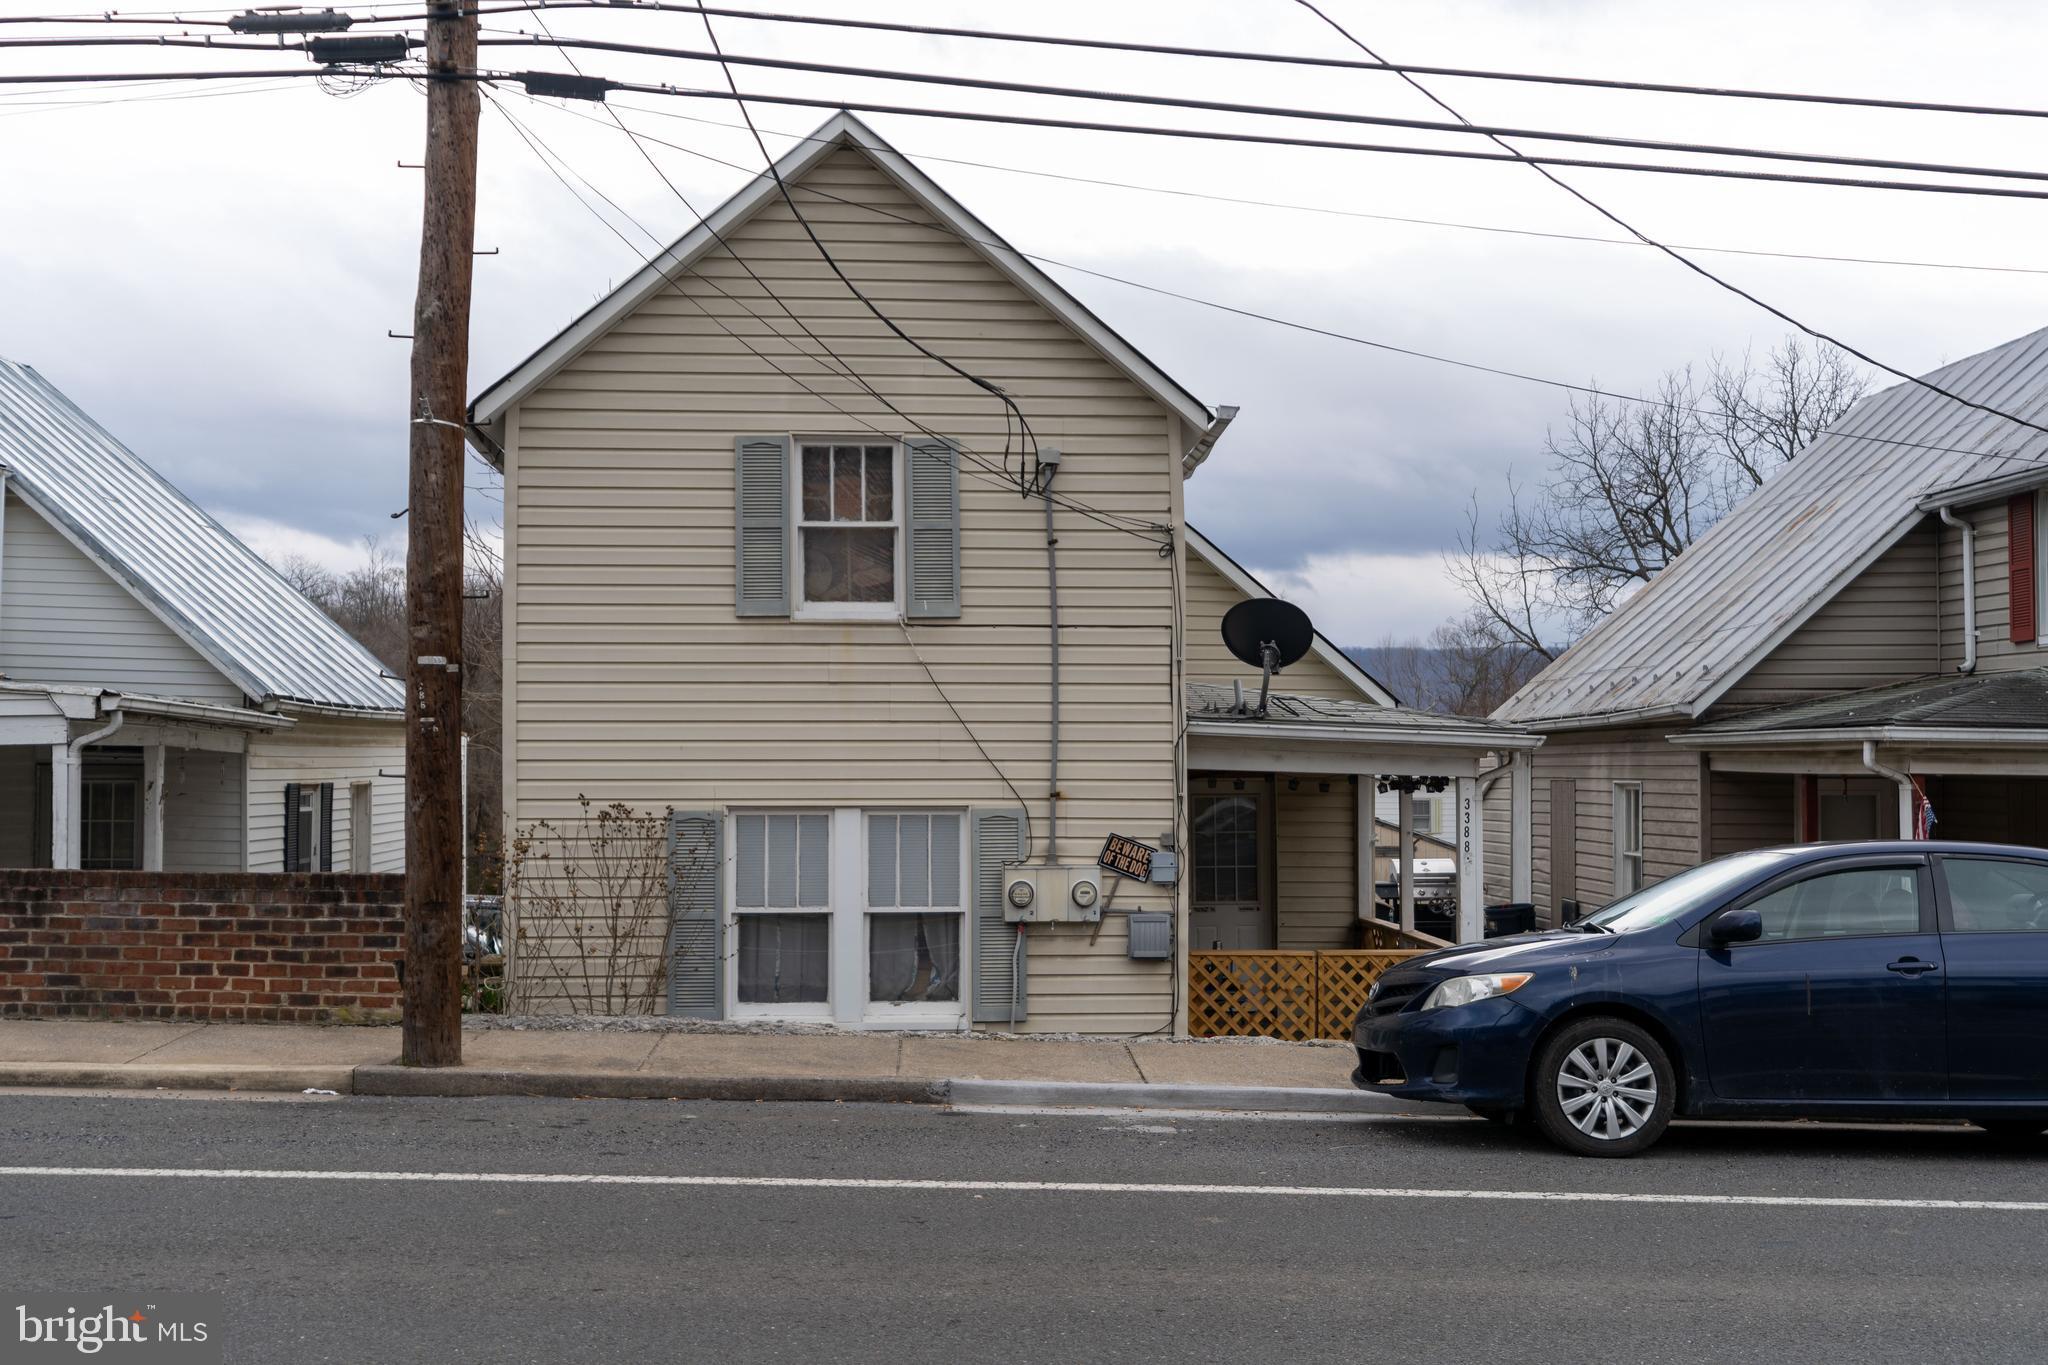 3388 N MAIN STREET, TOMS BROOK, VA 22660